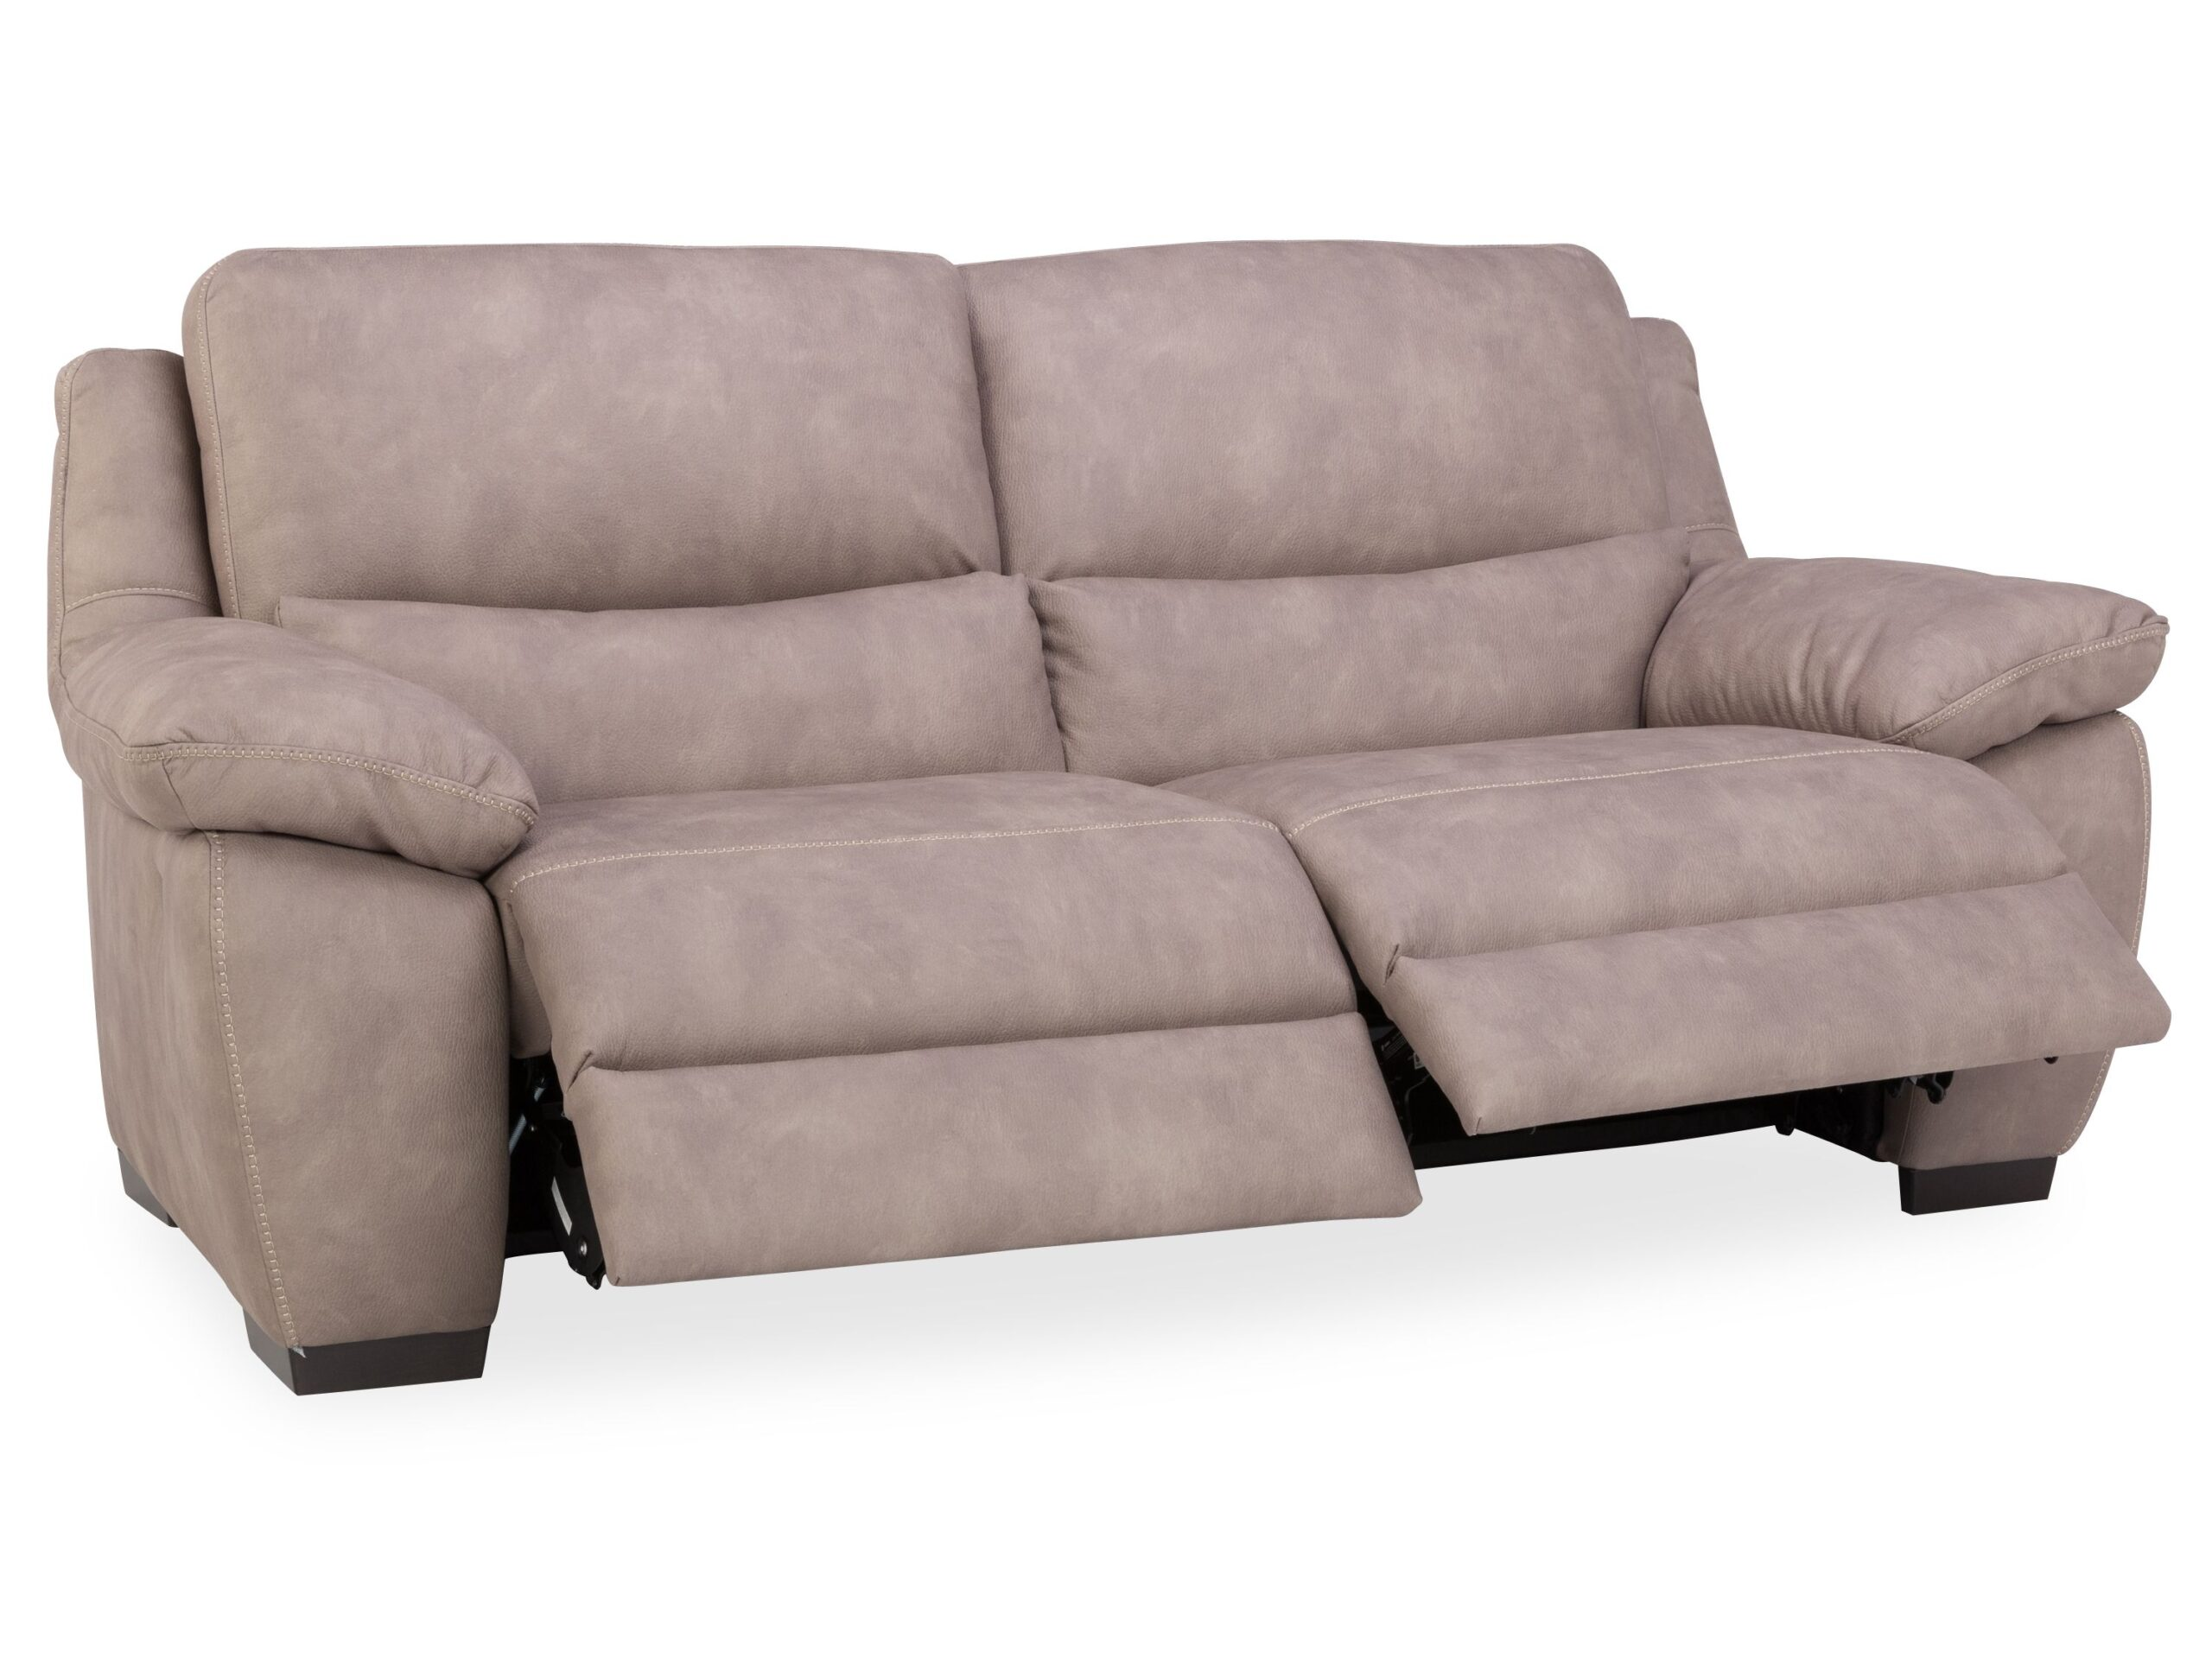 Full Size of Megasofa Aruba Sofa 3 Sitzer Vito Sideros Einzelsofas Polstermbel Mbel Wohnzimmer Megasofa Aruba